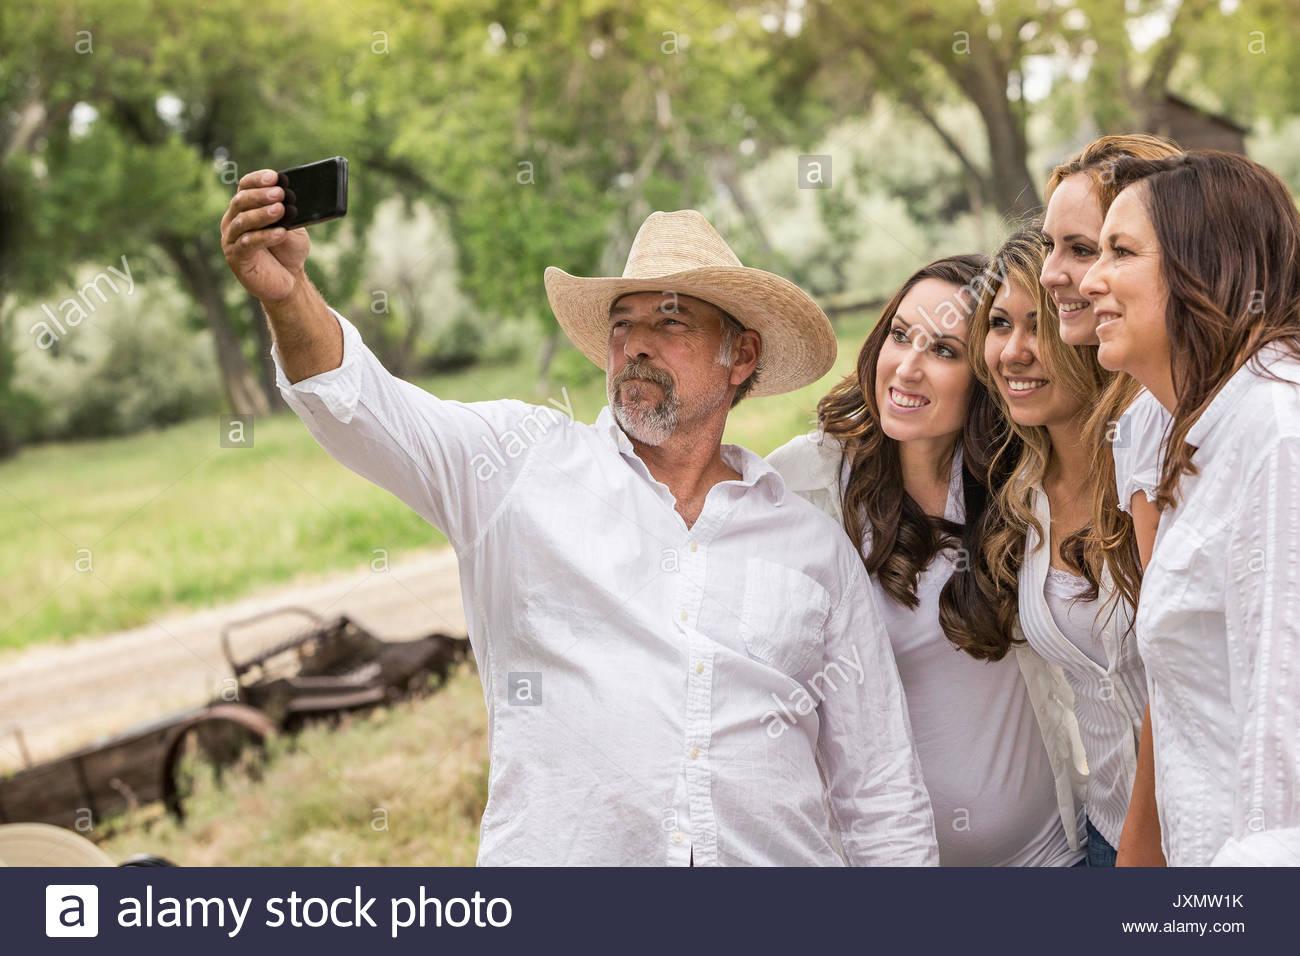 Mature man taking smartphone selfie with women on ranch, Bridger, Montana, USA - Stock Image